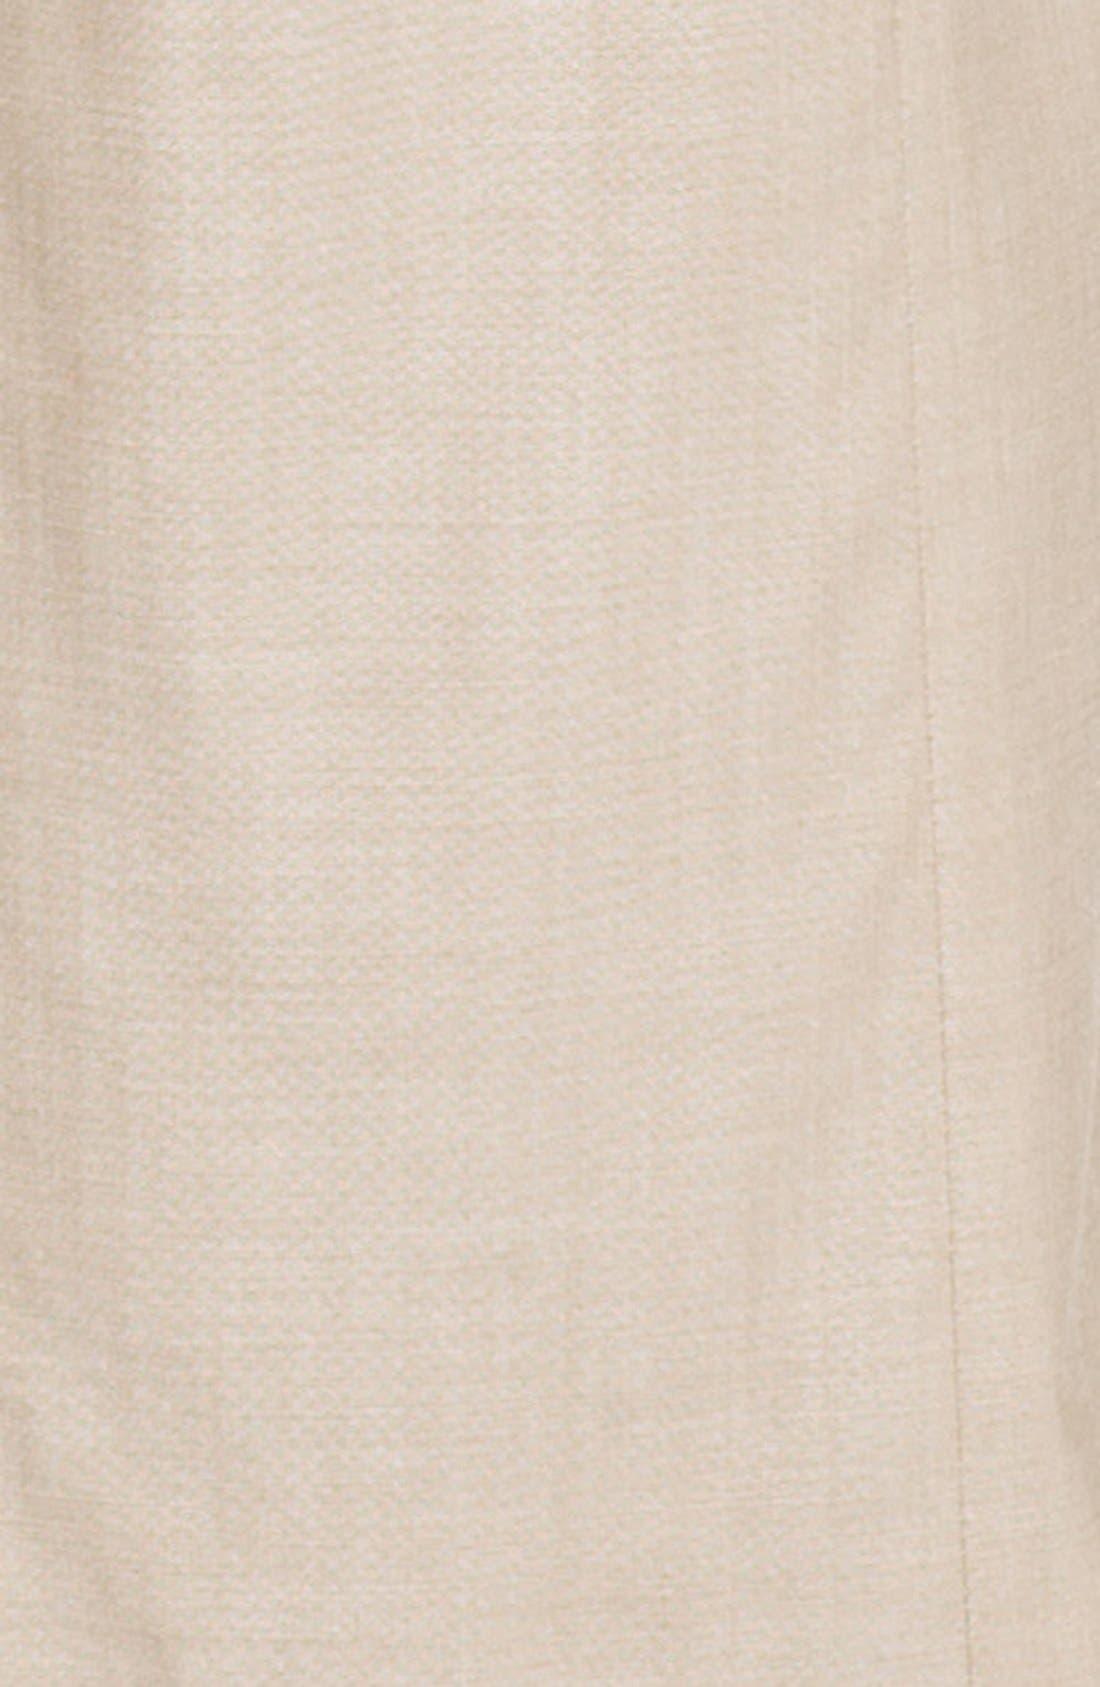 HUGO BOSS 'Tilana' Trousers,                             Alternate thumbnail 2, color,                             294